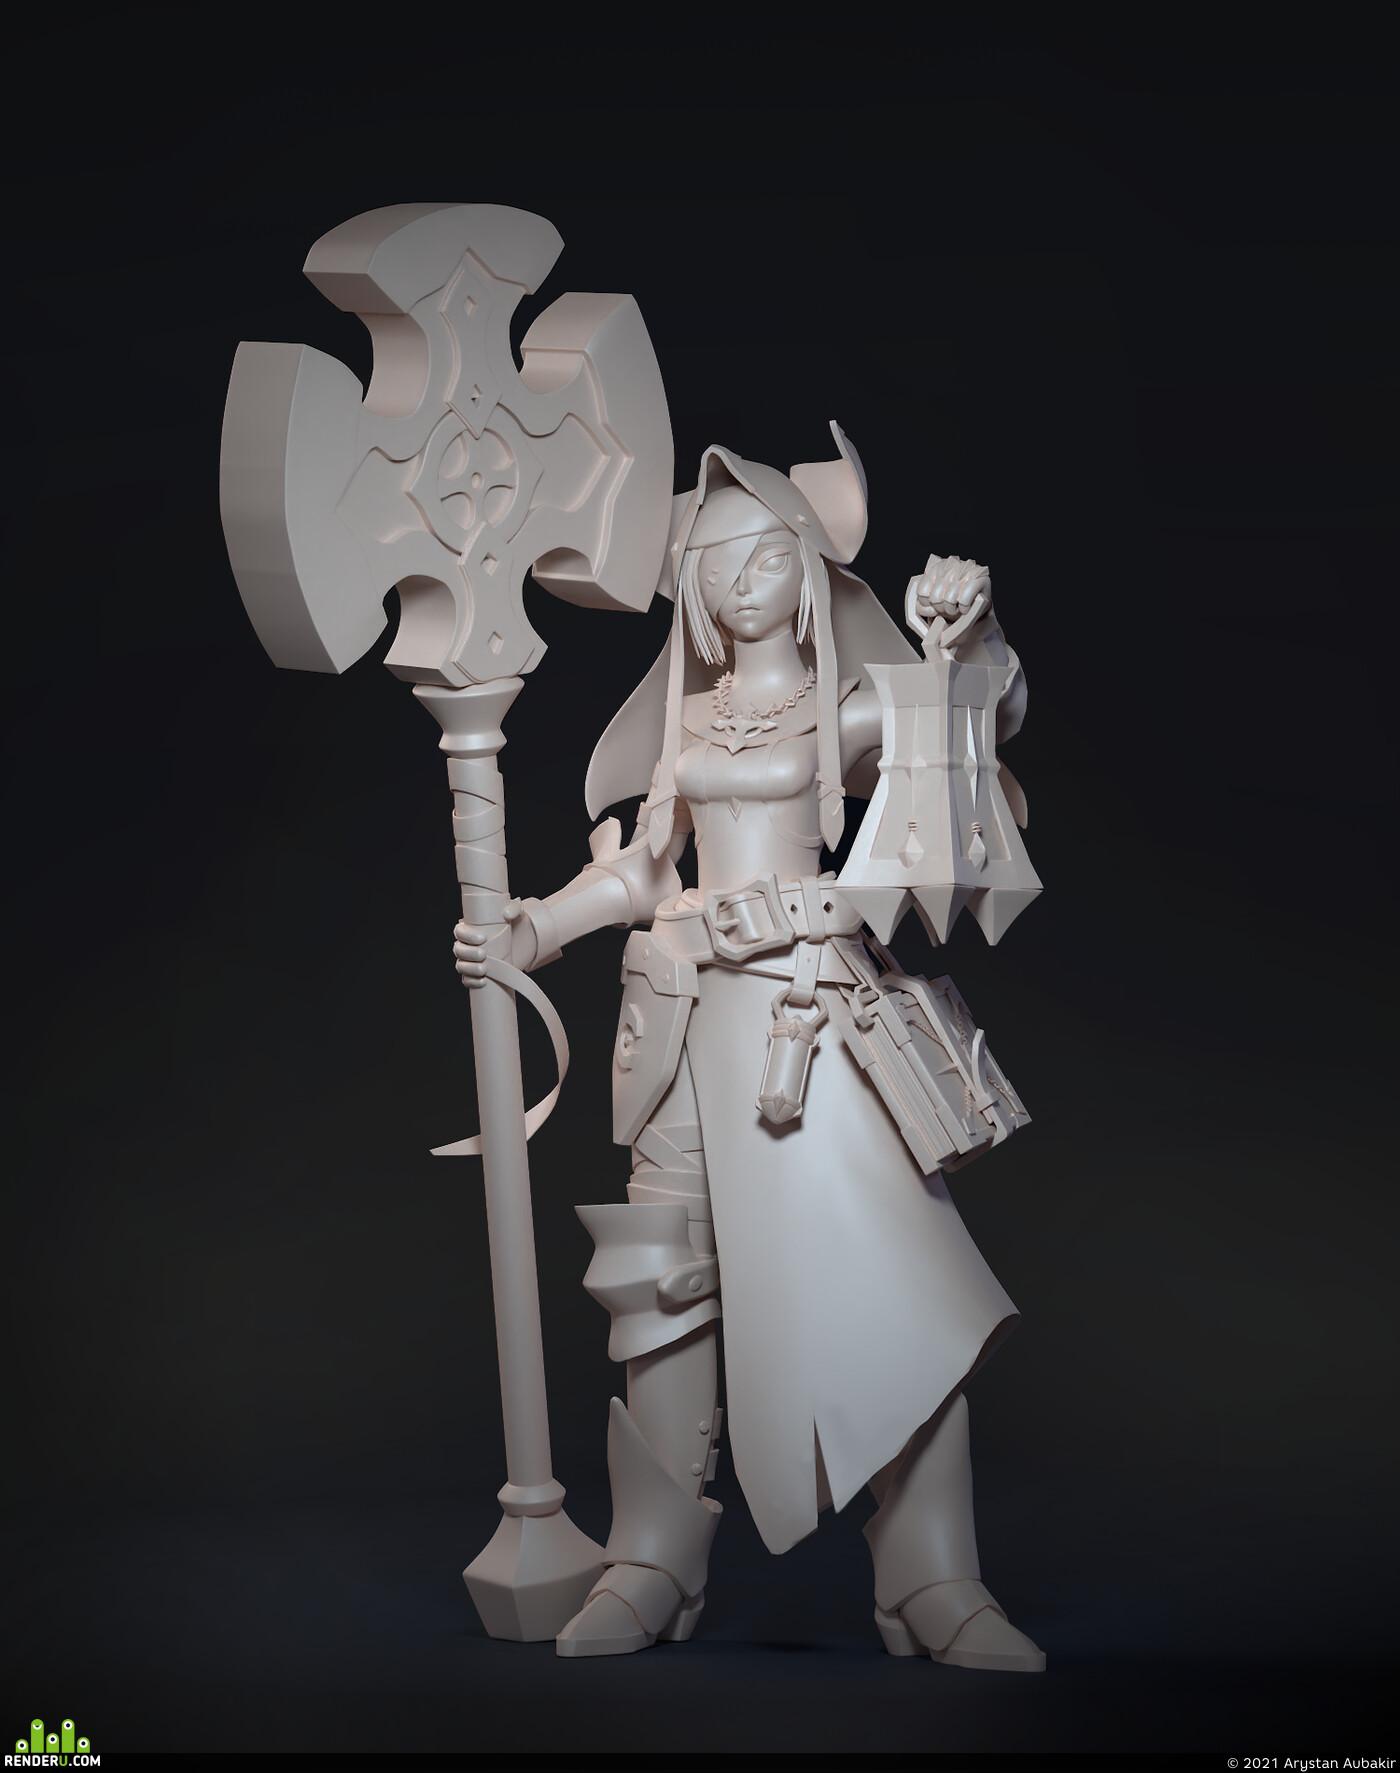 Digital 3D, Concept Art, stylized, Character Modeling, exorsict, hammer